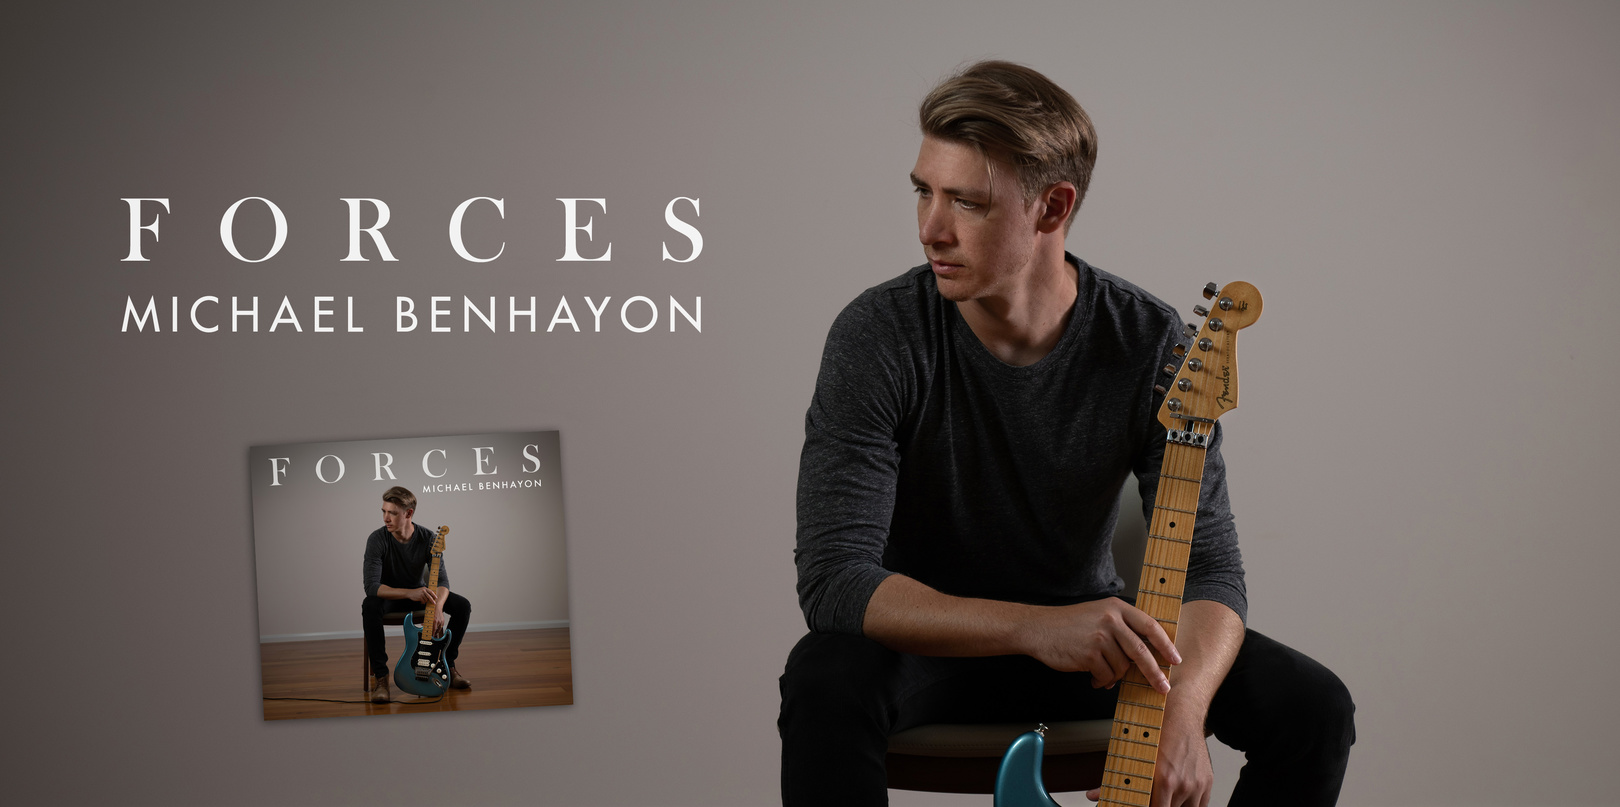 """FORCES"" by Michael Benhayon - thumbnail version"